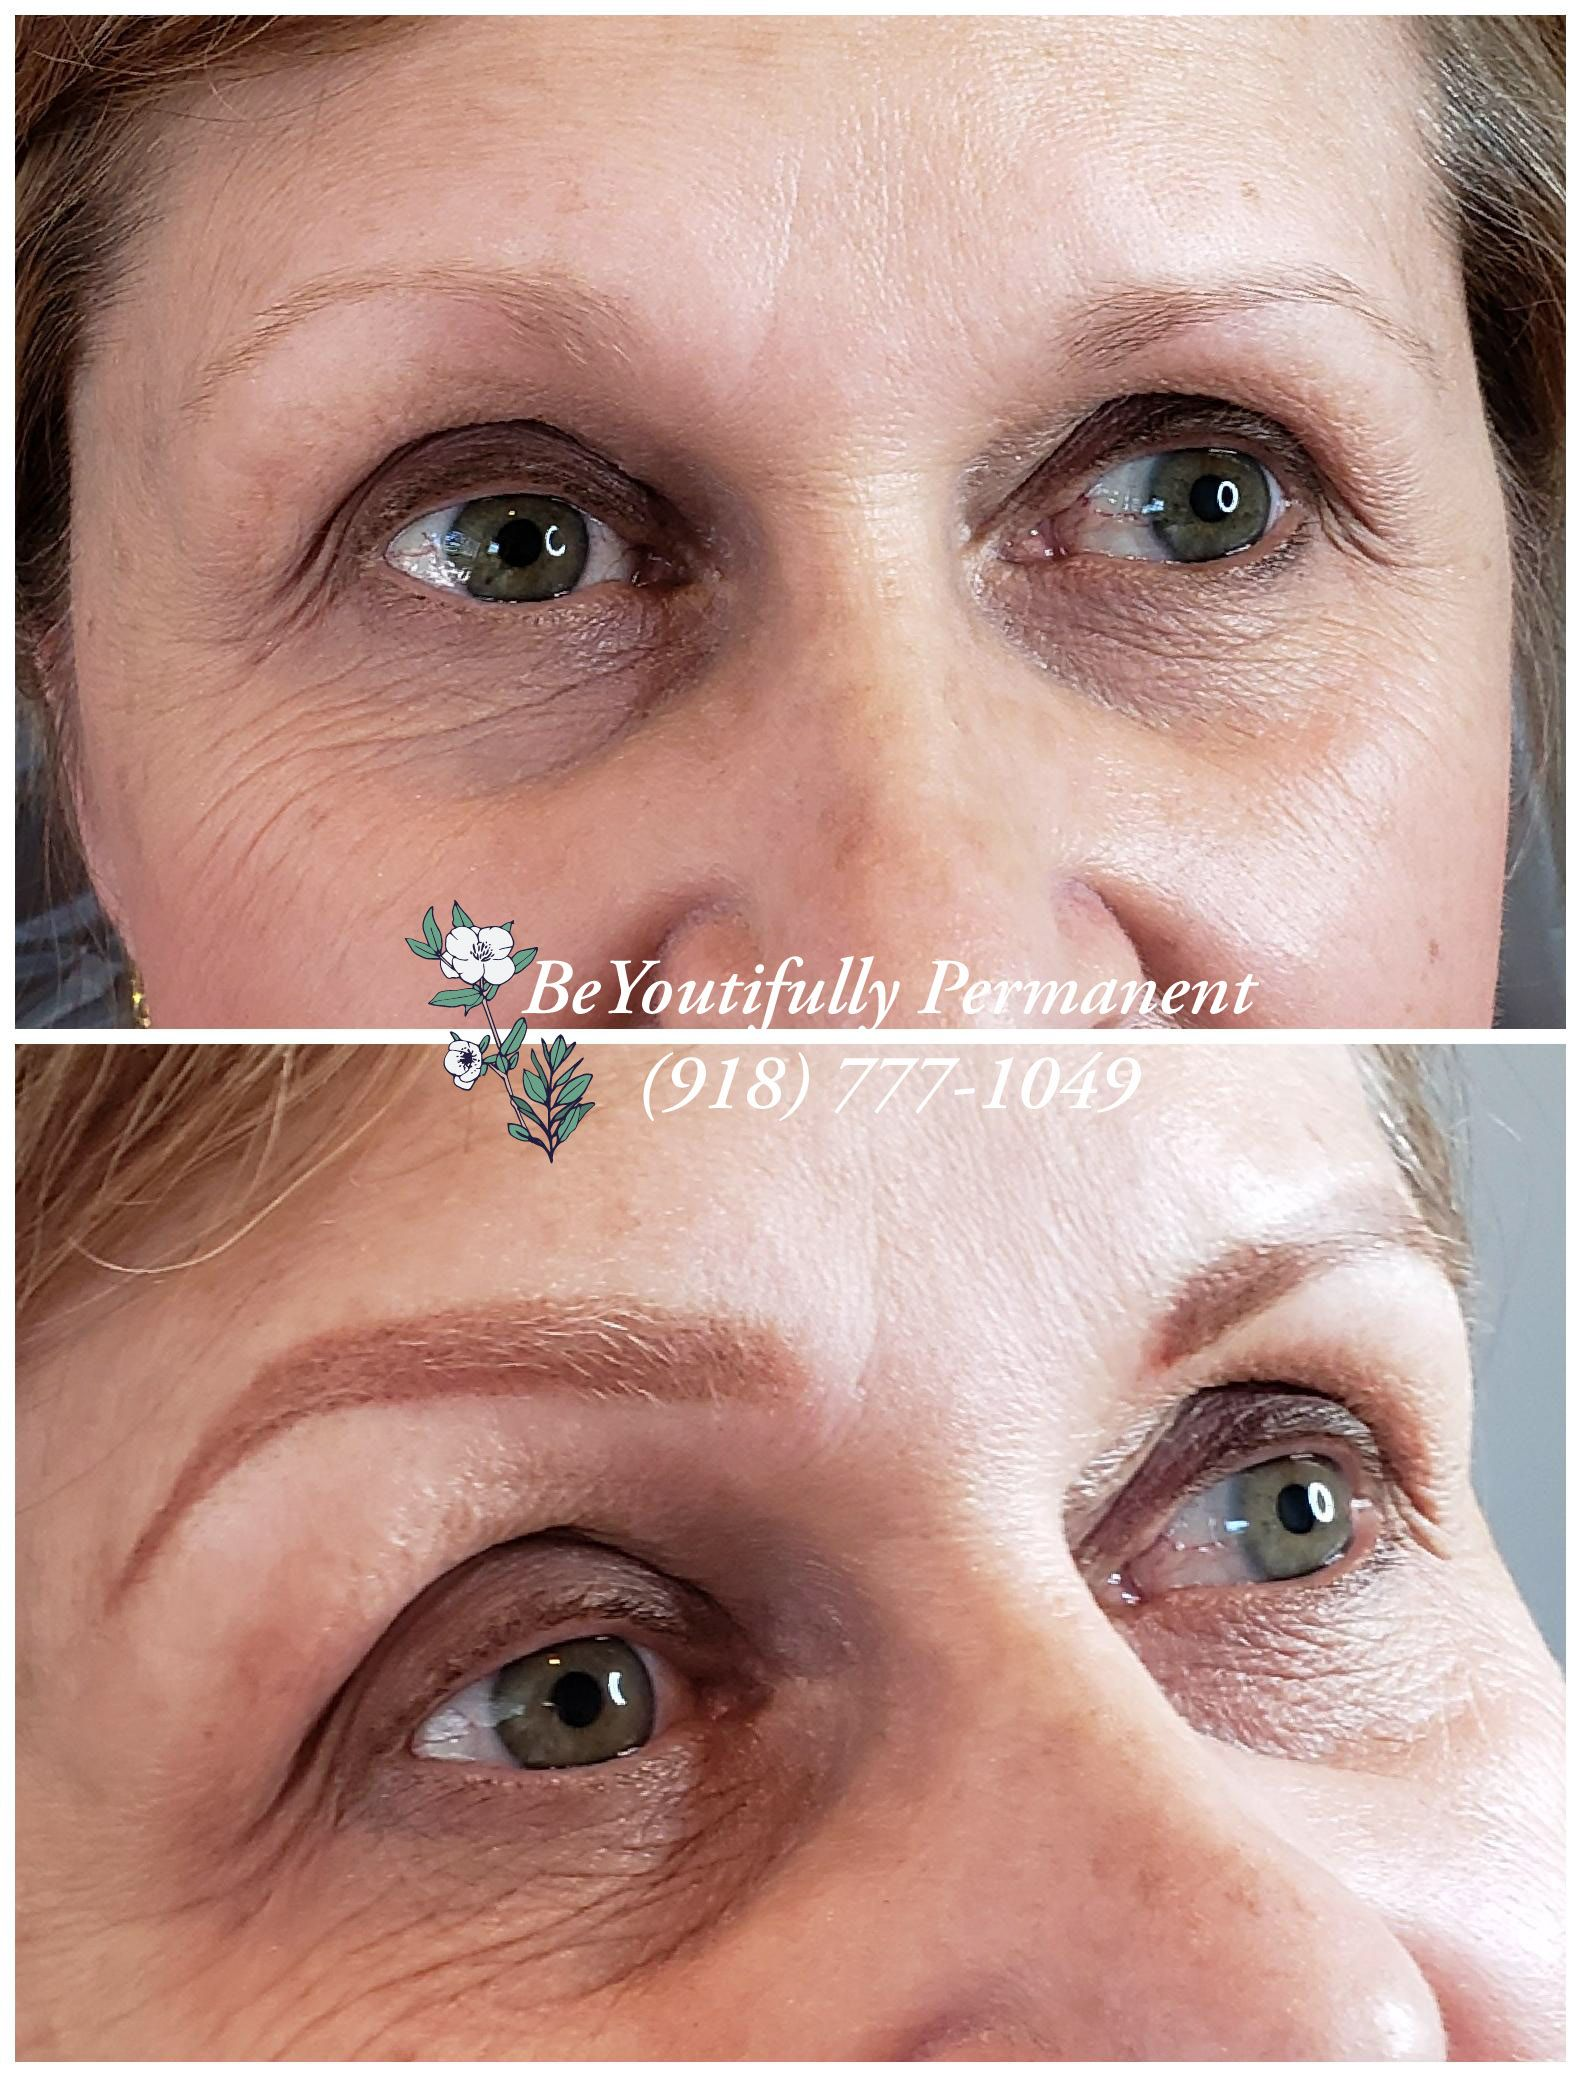 Awesome permanent makeup tulsa oklahoma and view